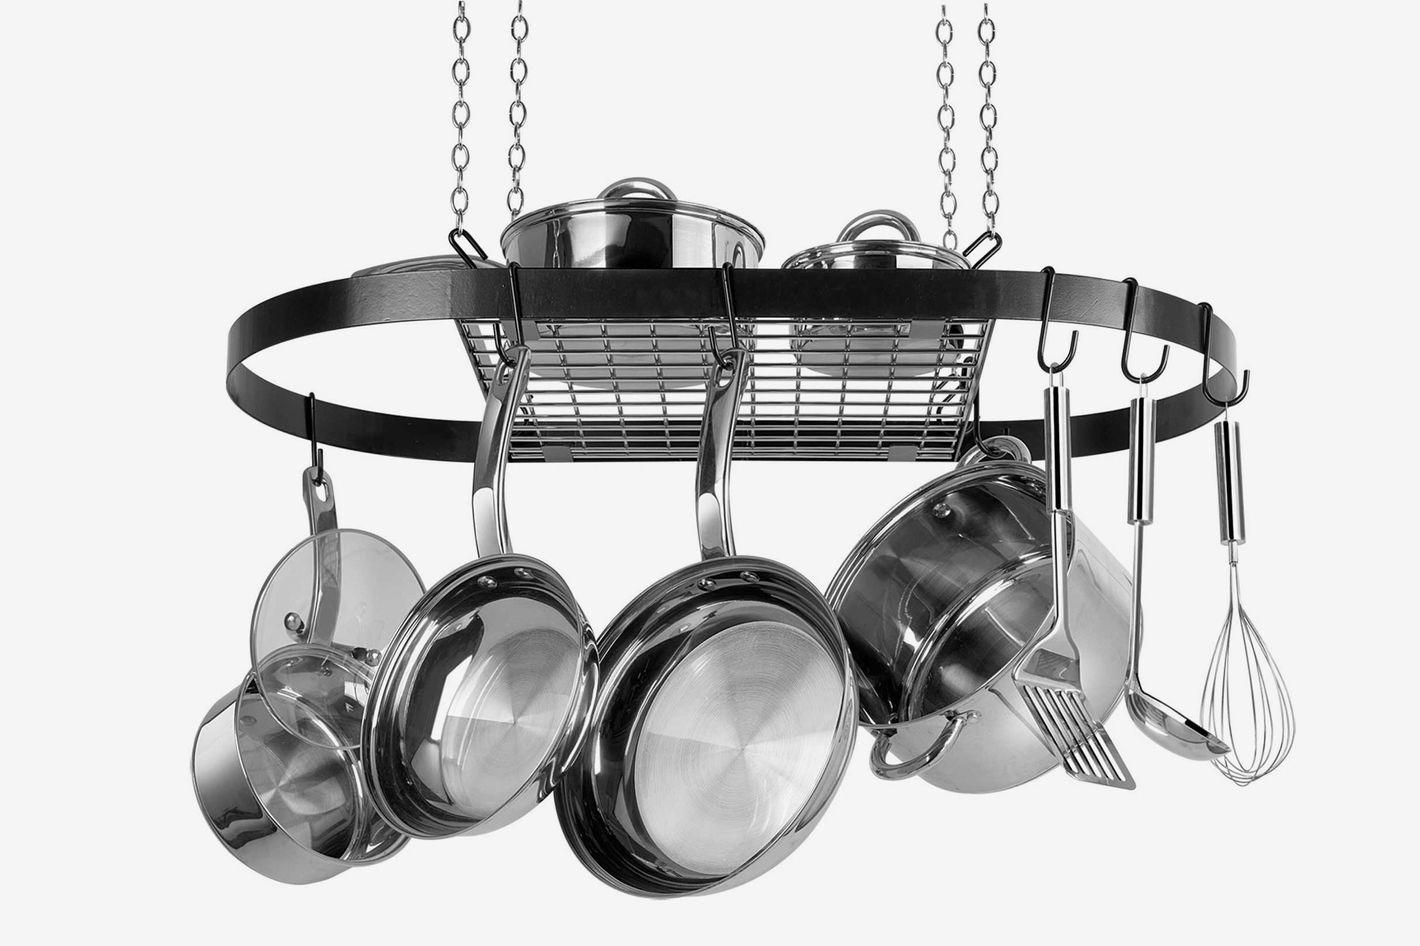 Range Kleen Oval Hanging Pot Rack in Black